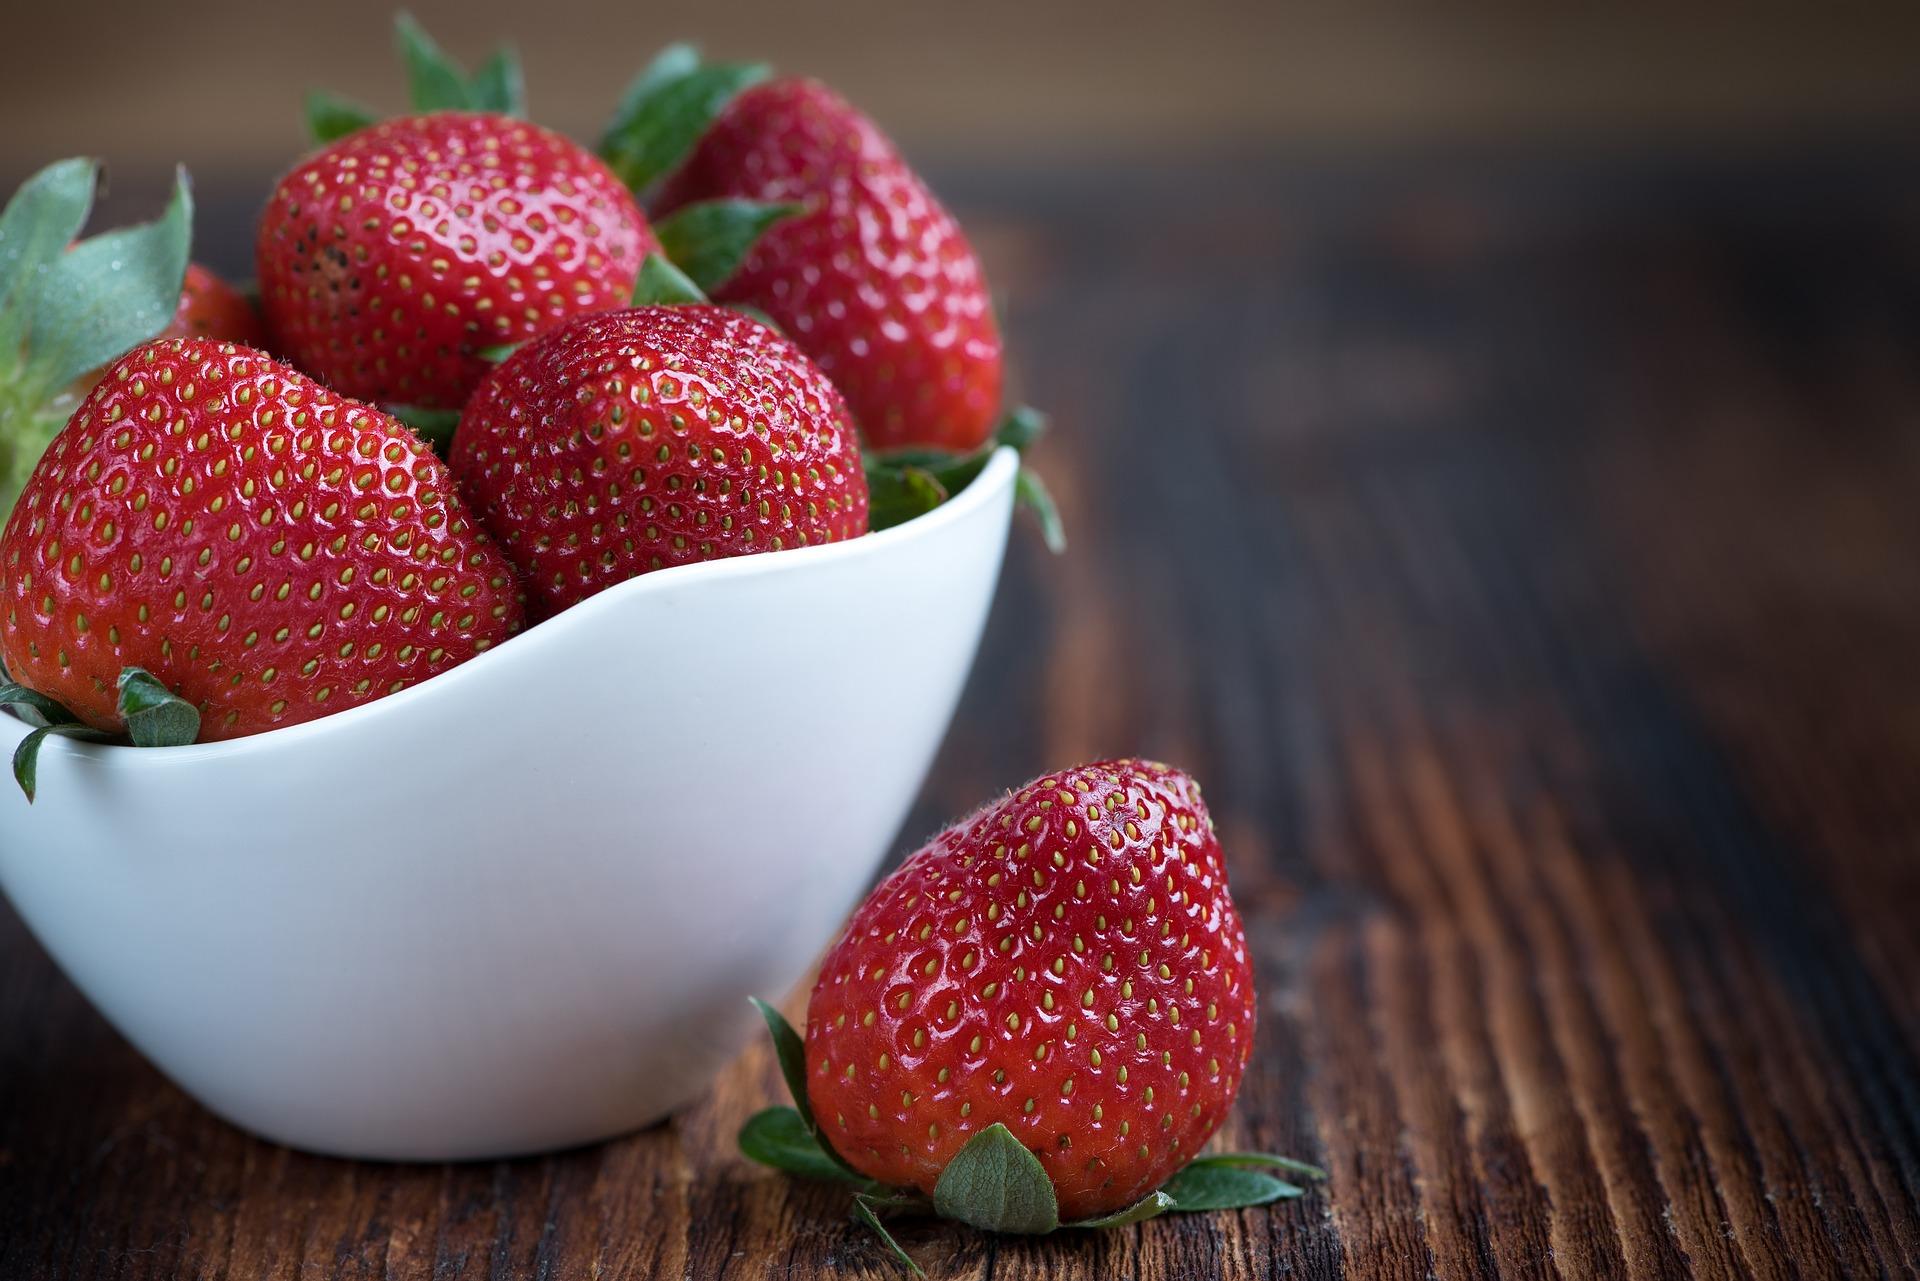 Zdravé recepty s jahodami